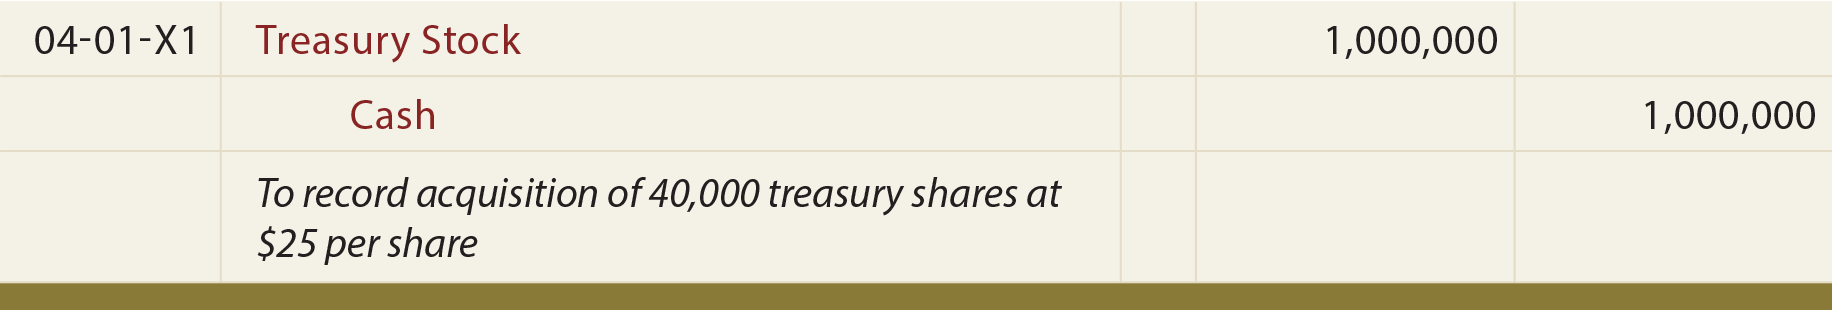 Treasury Stock Principlesofaccounting